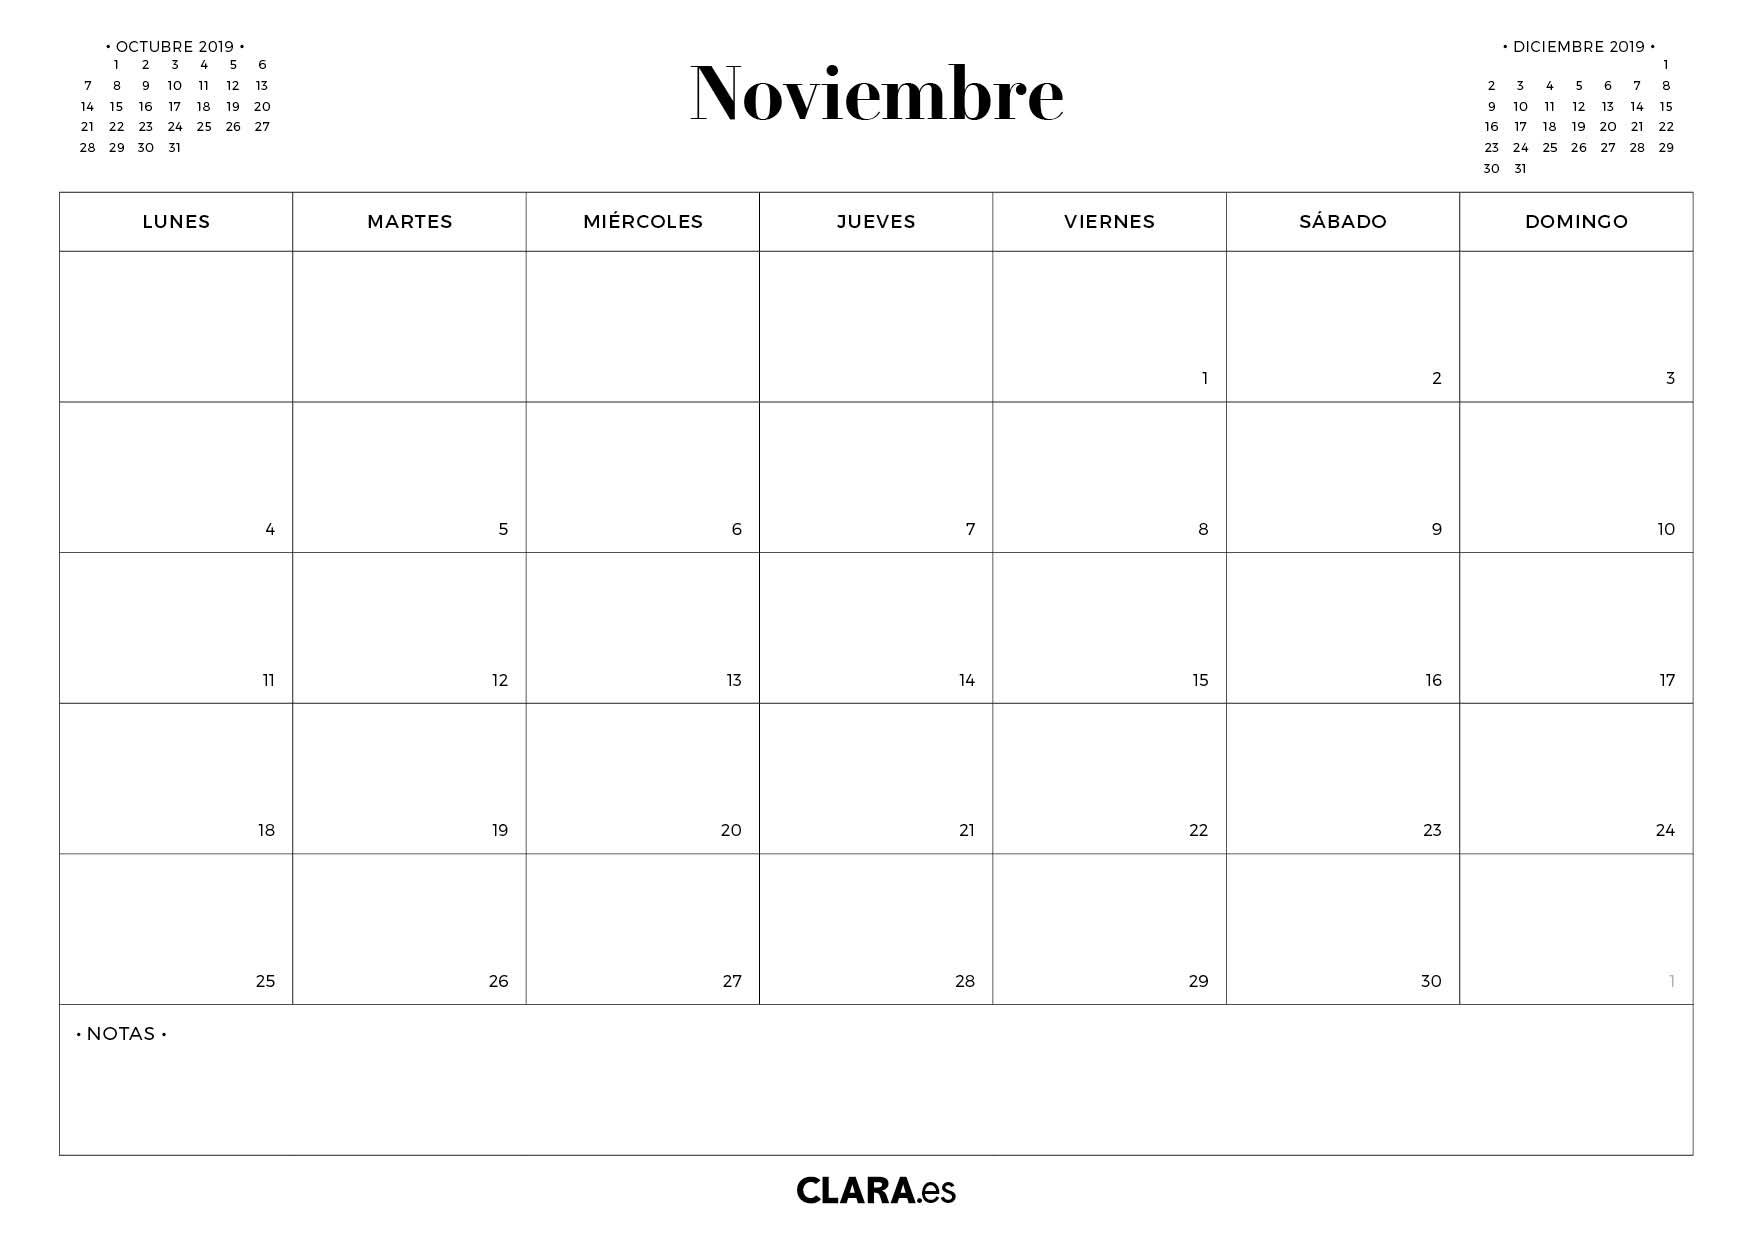 Calendario Noviembre 2019 Para Imprimir Gratis (En Pdf Y Jpg) in Calendrio 2013 Para Imprimir Gratis